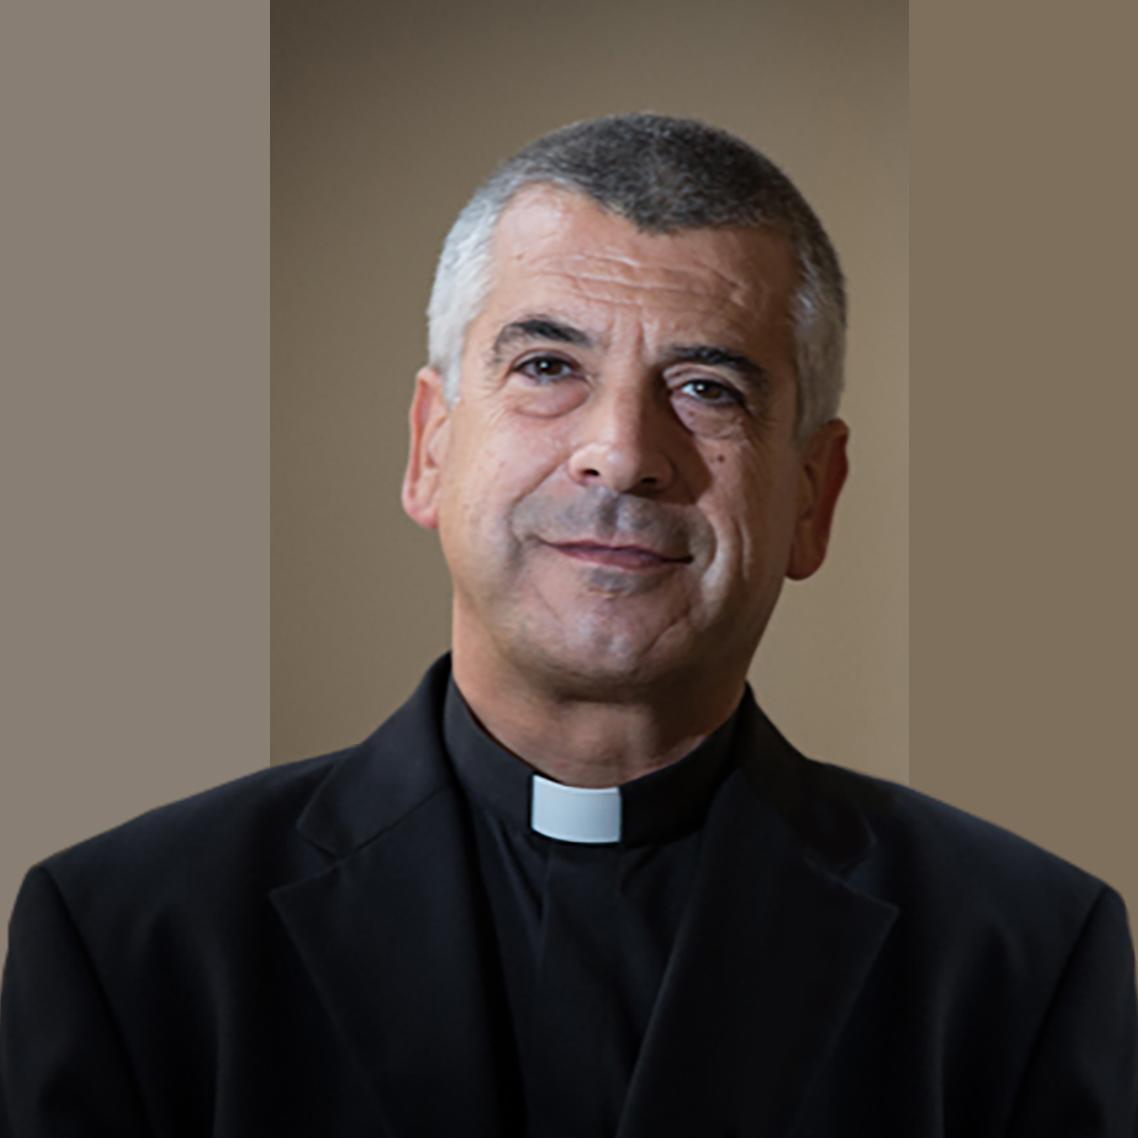 Don Francesco Soddu